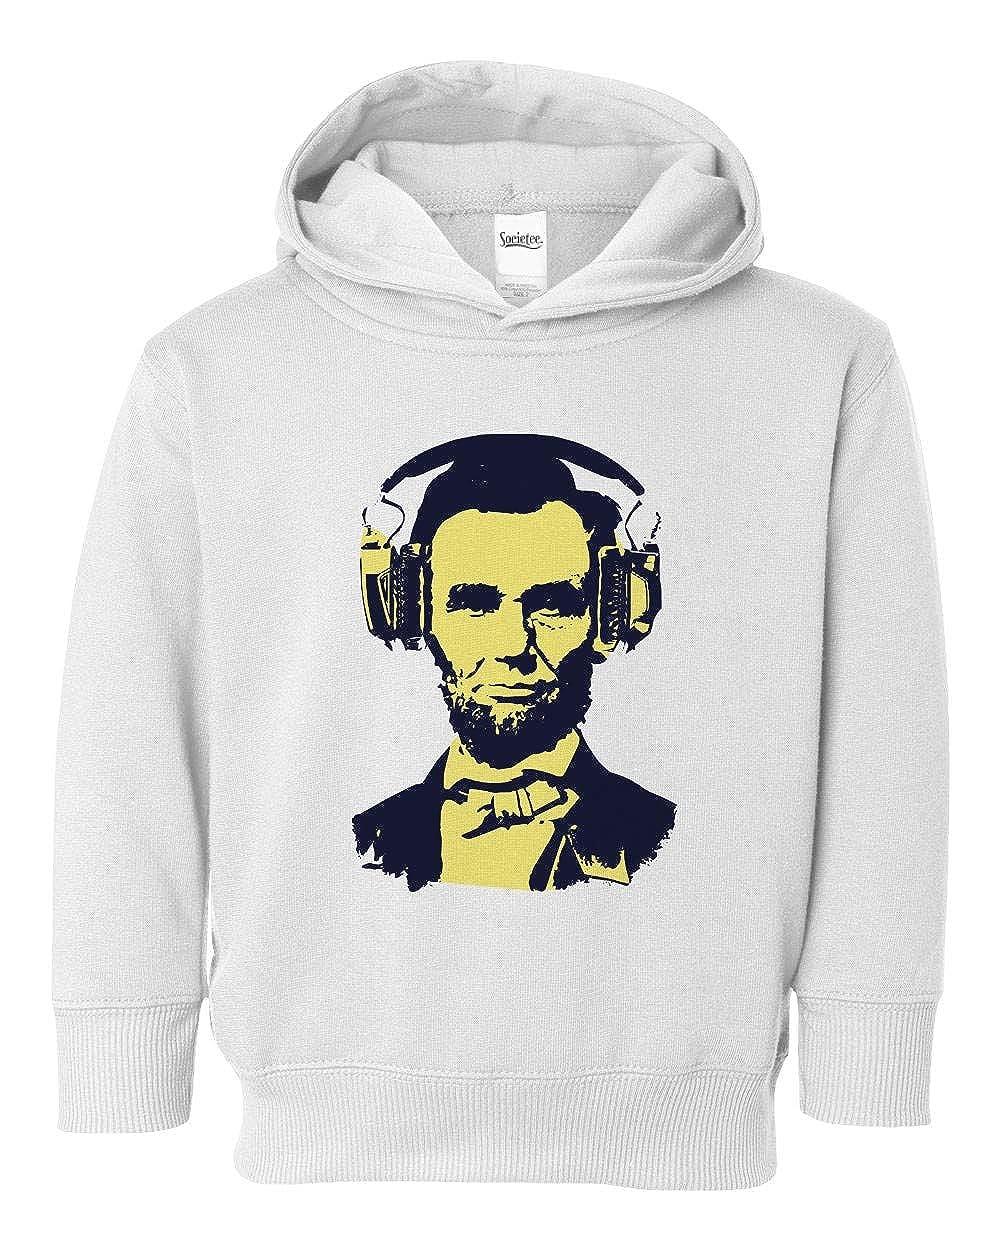 Societee Abraham Lincoln Headphones Cool Girls Boys Toddler Hooded Sweatshirt